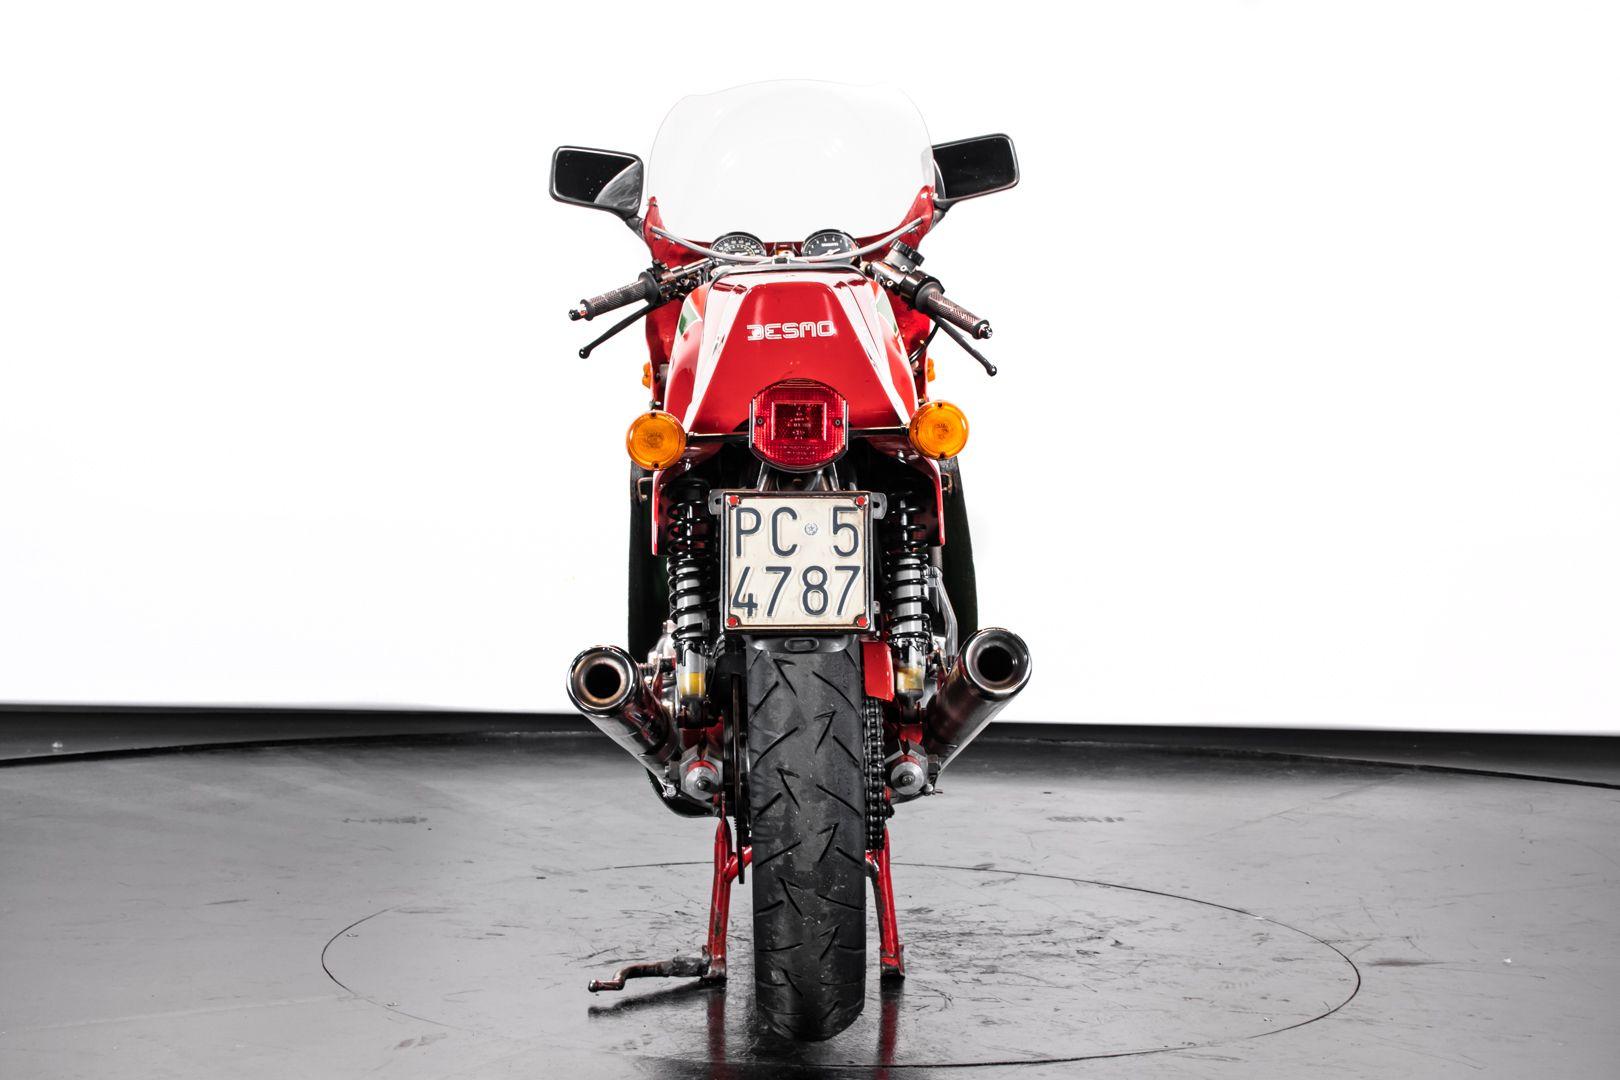 1983 Ducati 900 Mike Hailwood Replica 71410